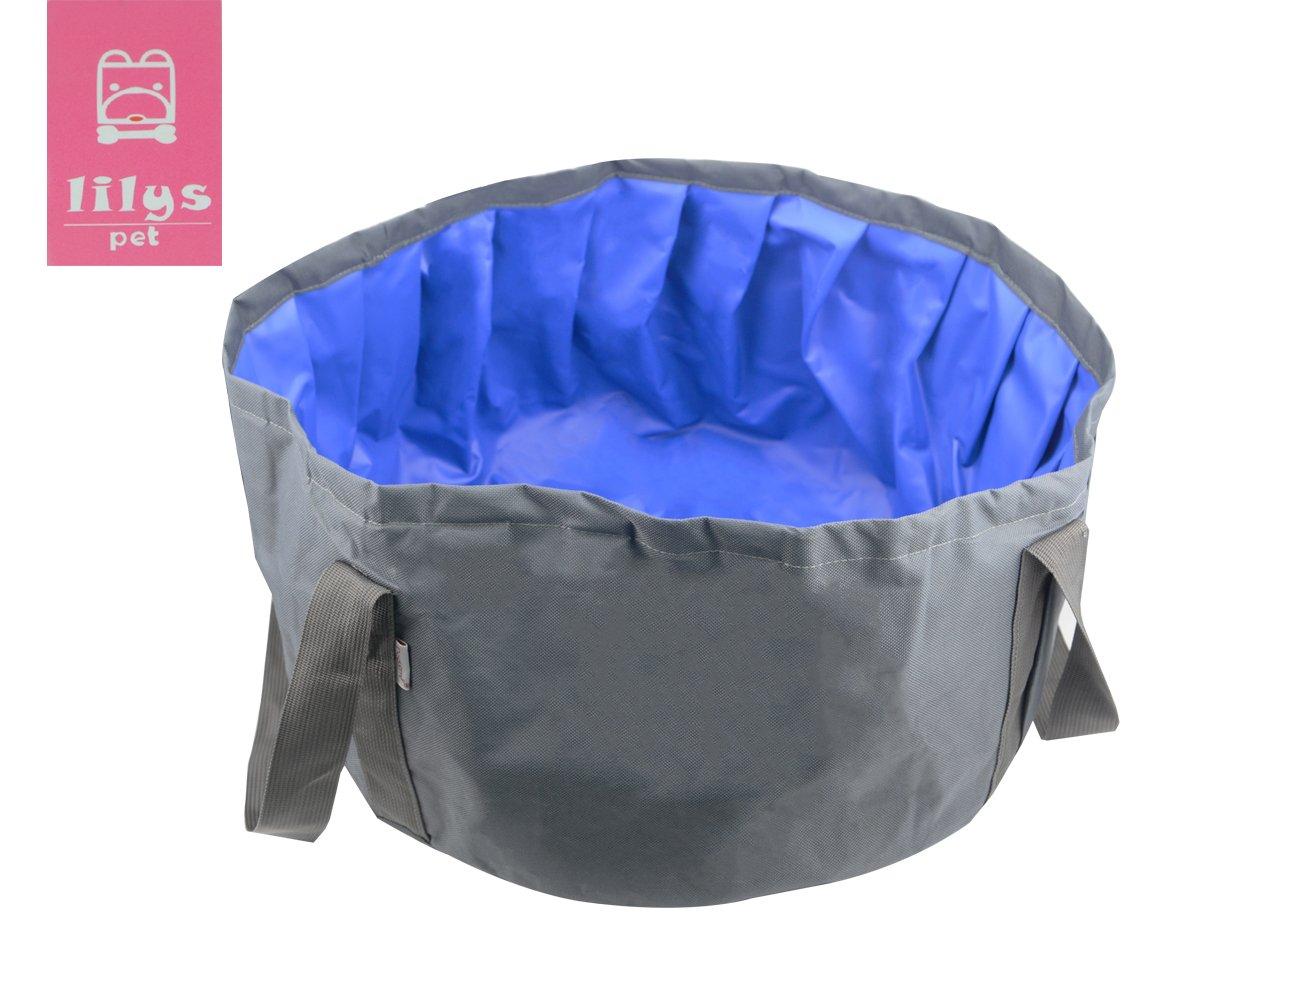 LILYS PET Portable Folding Swimming